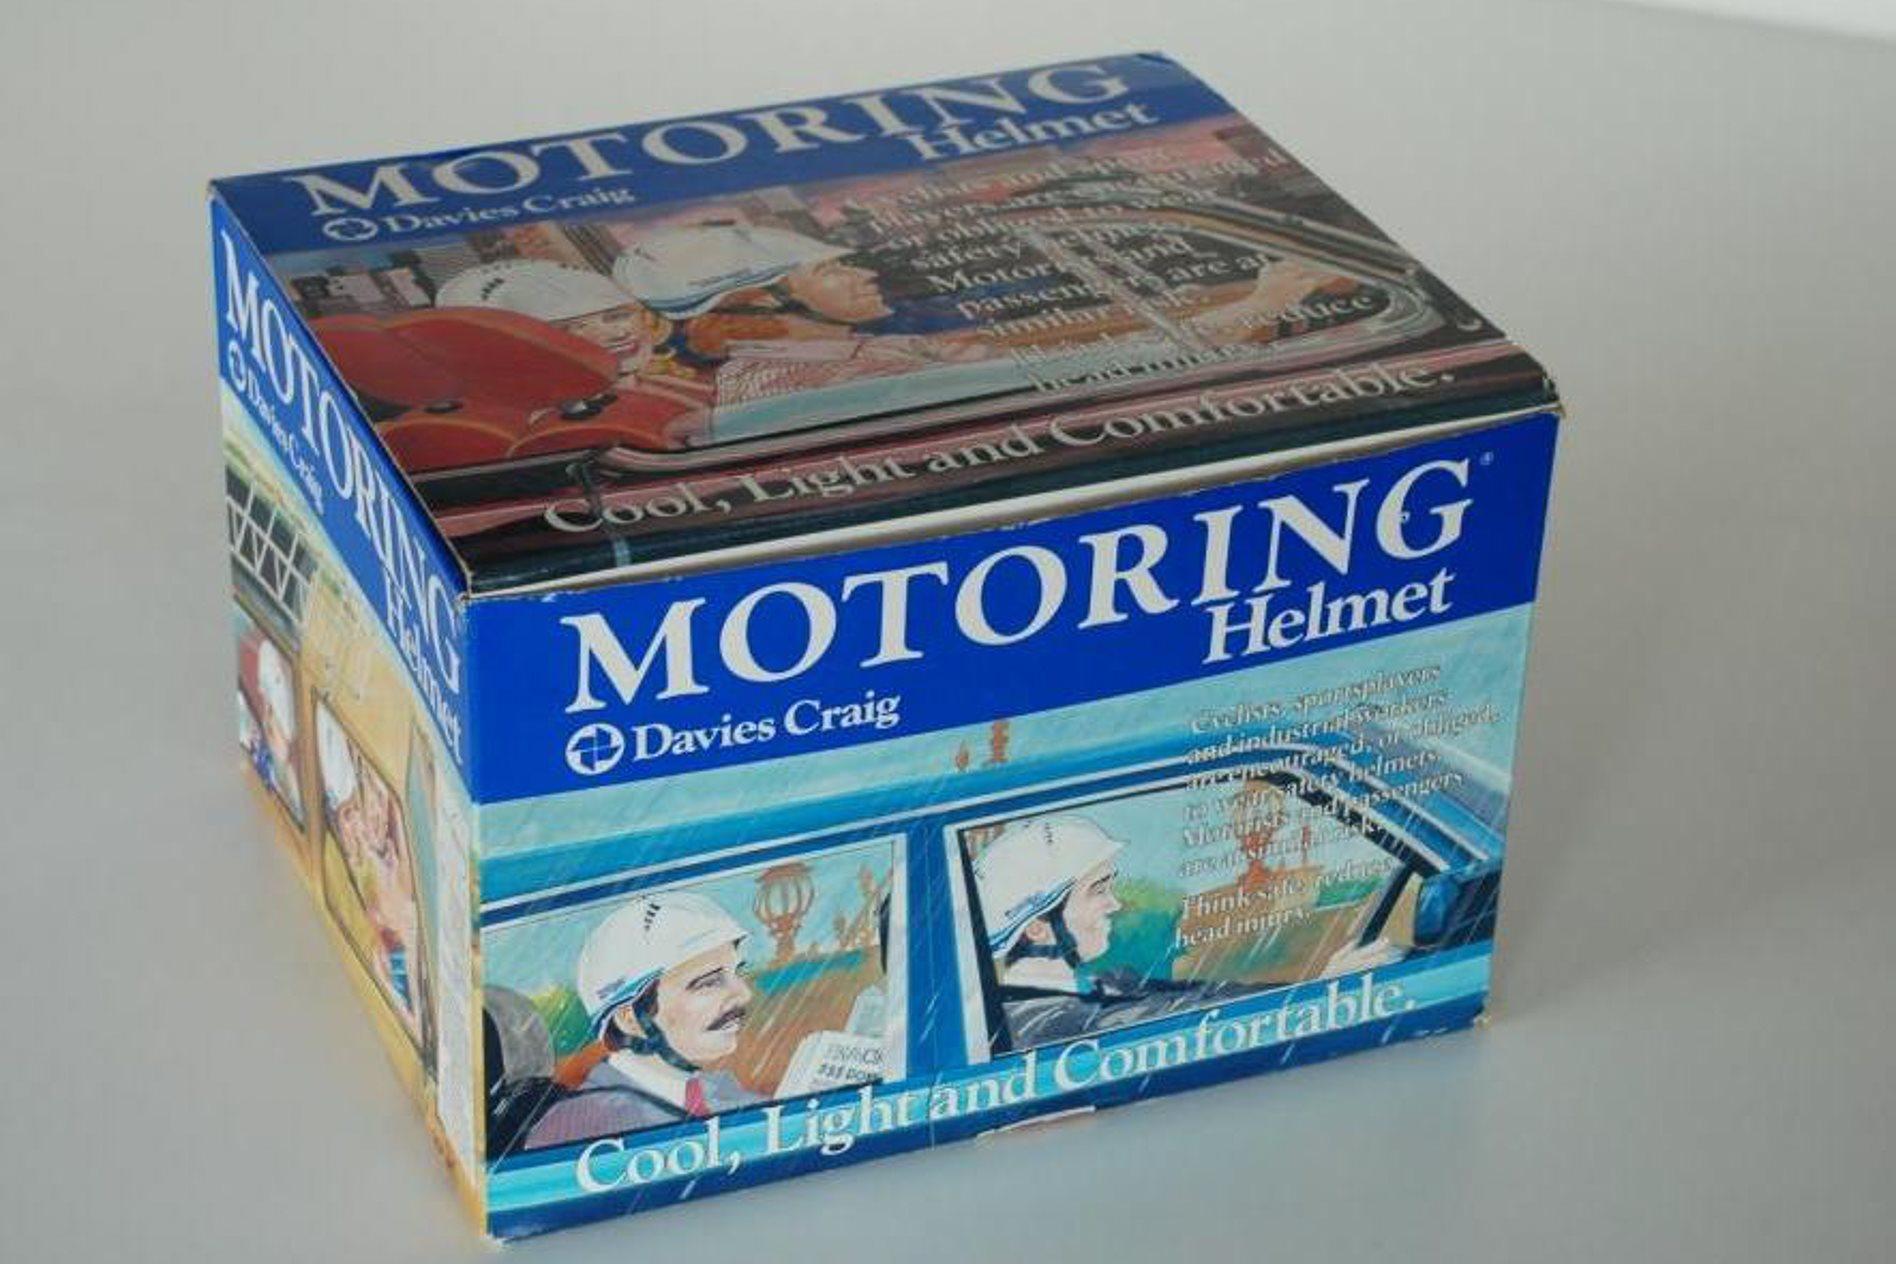 1980s Aussie innovation: the passenger car helmet